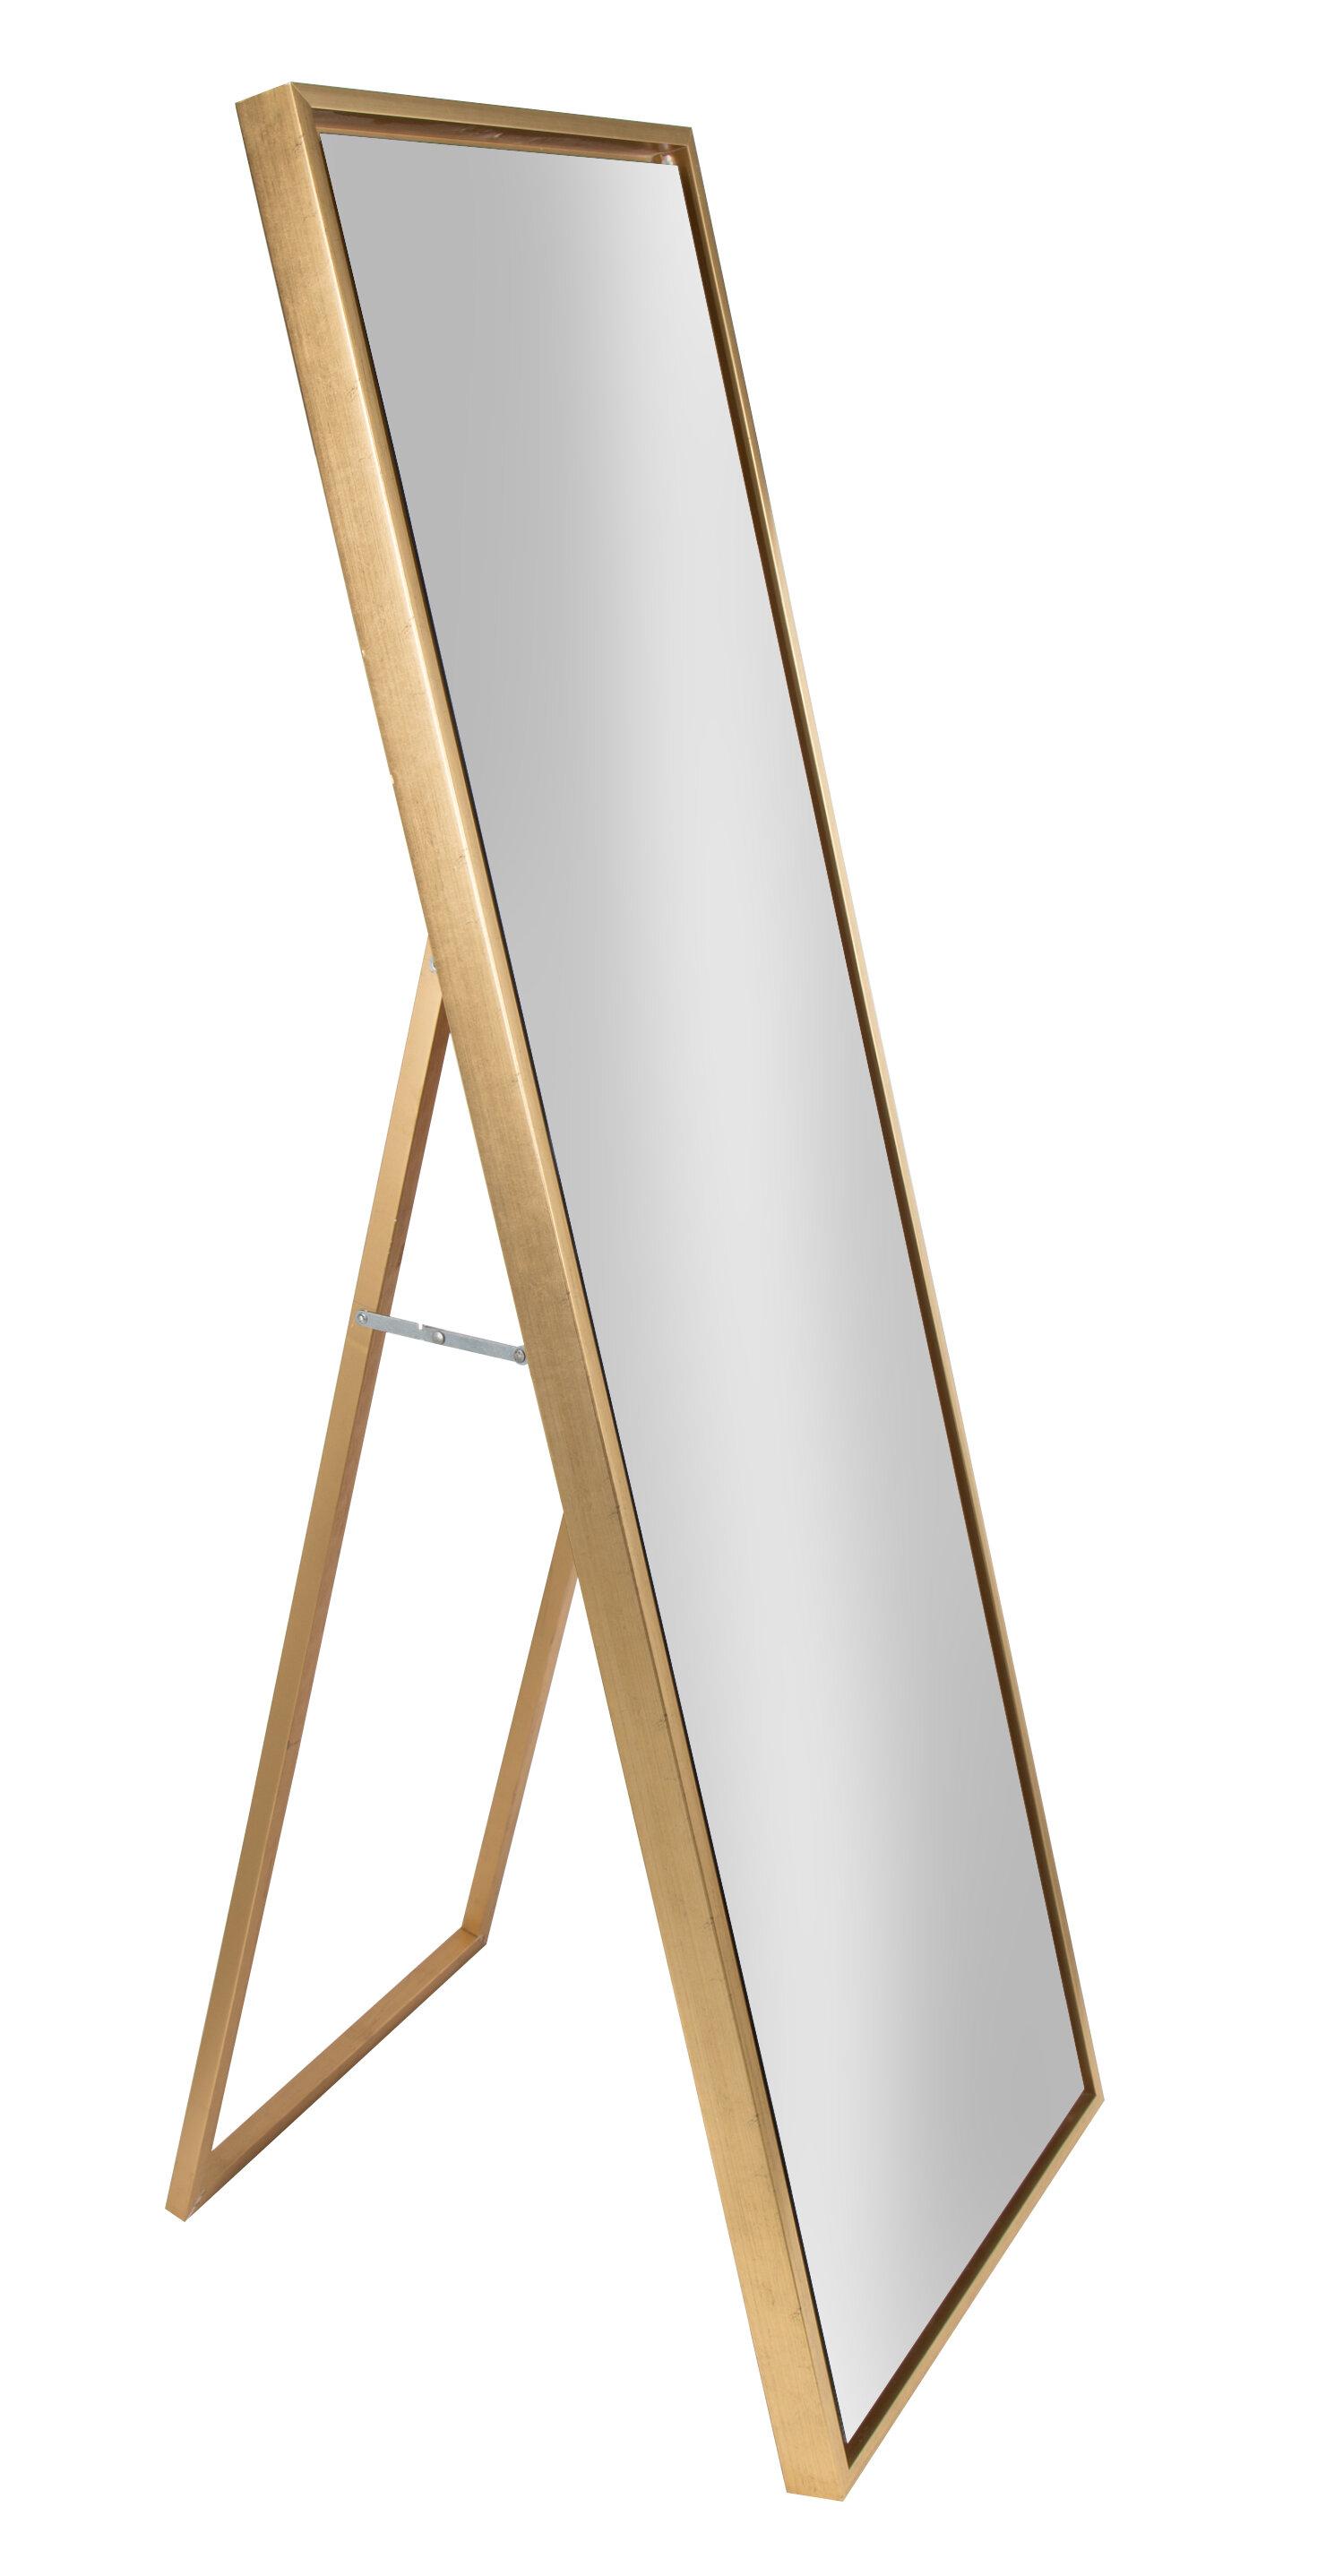 Gold Floor Mirrors You Ll Love In 2021 Wayfair